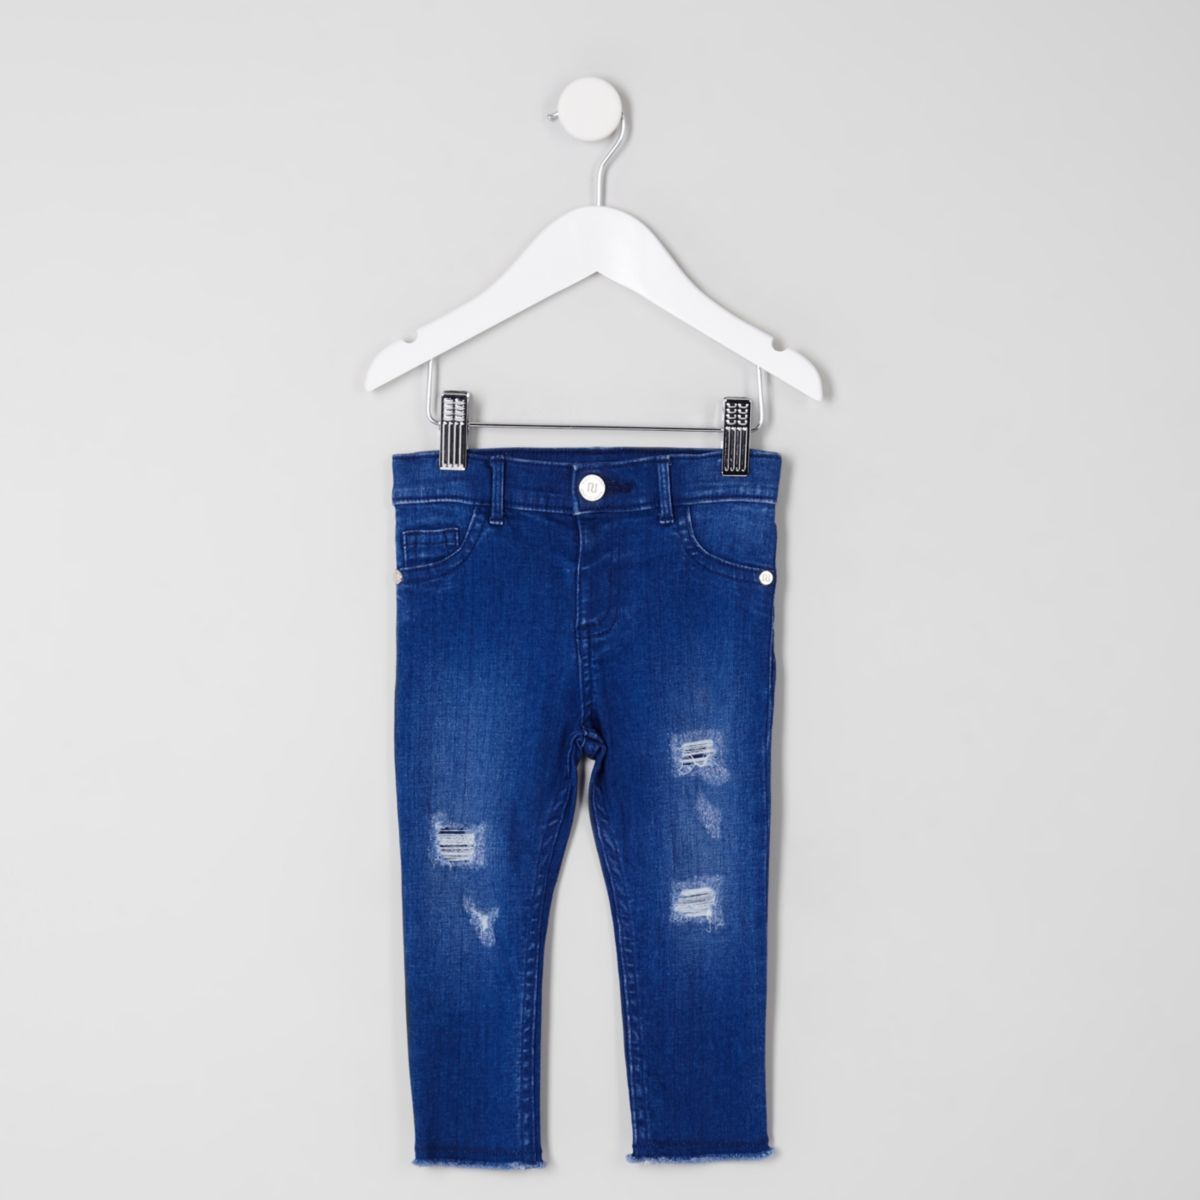 Molly – Blaue Jeans mit grobem Saum im Used-Look